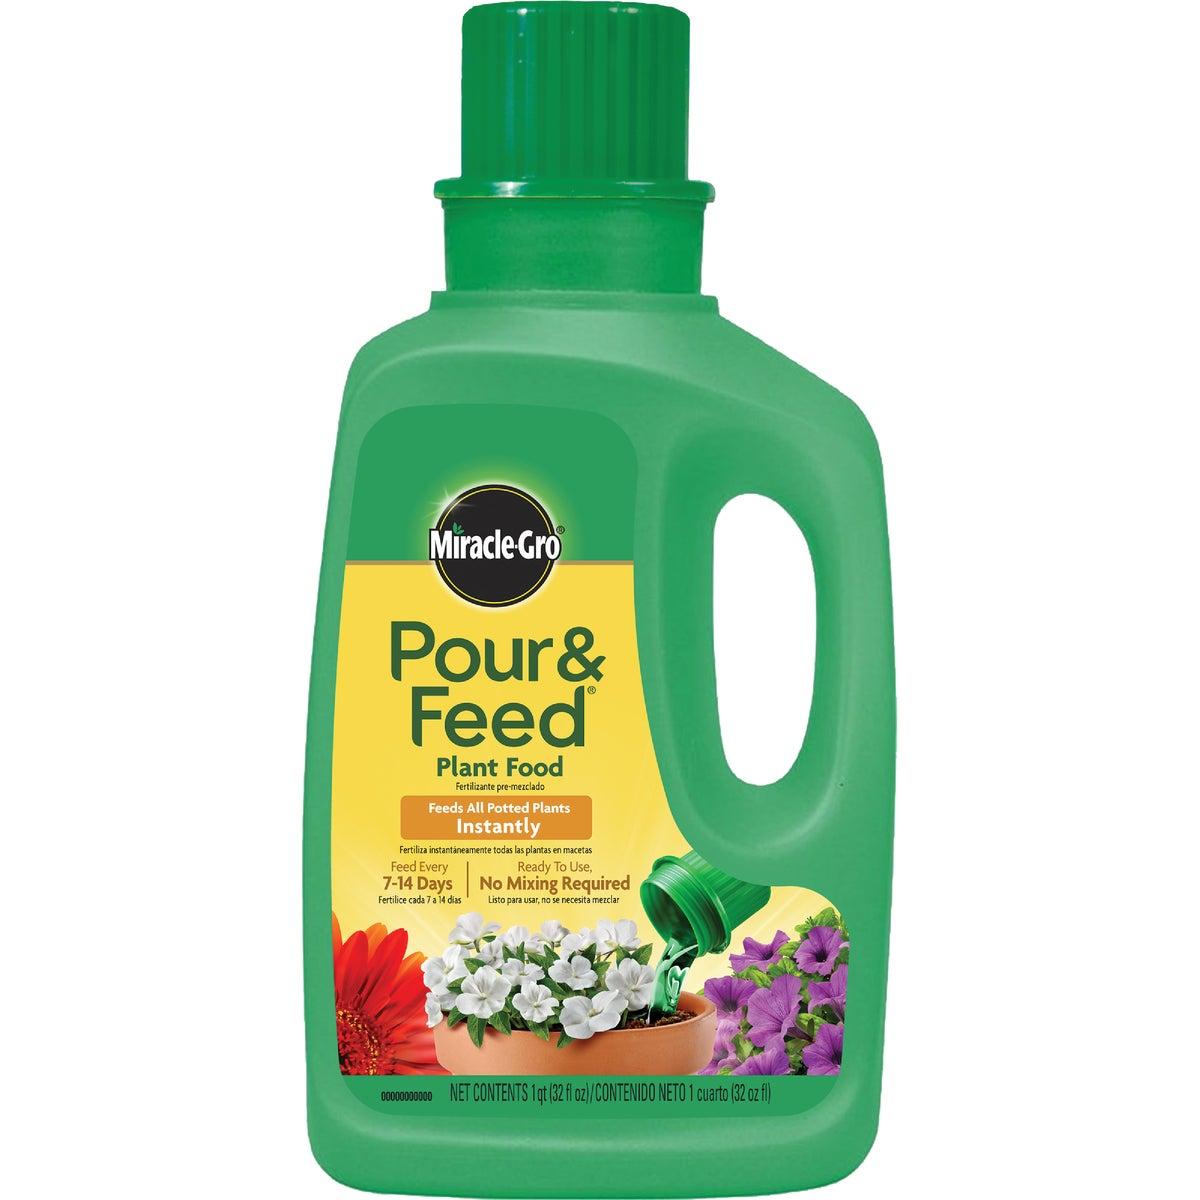 32OZ MGRO LIQ PLANT FOOD - 1006002 by Scotts Company